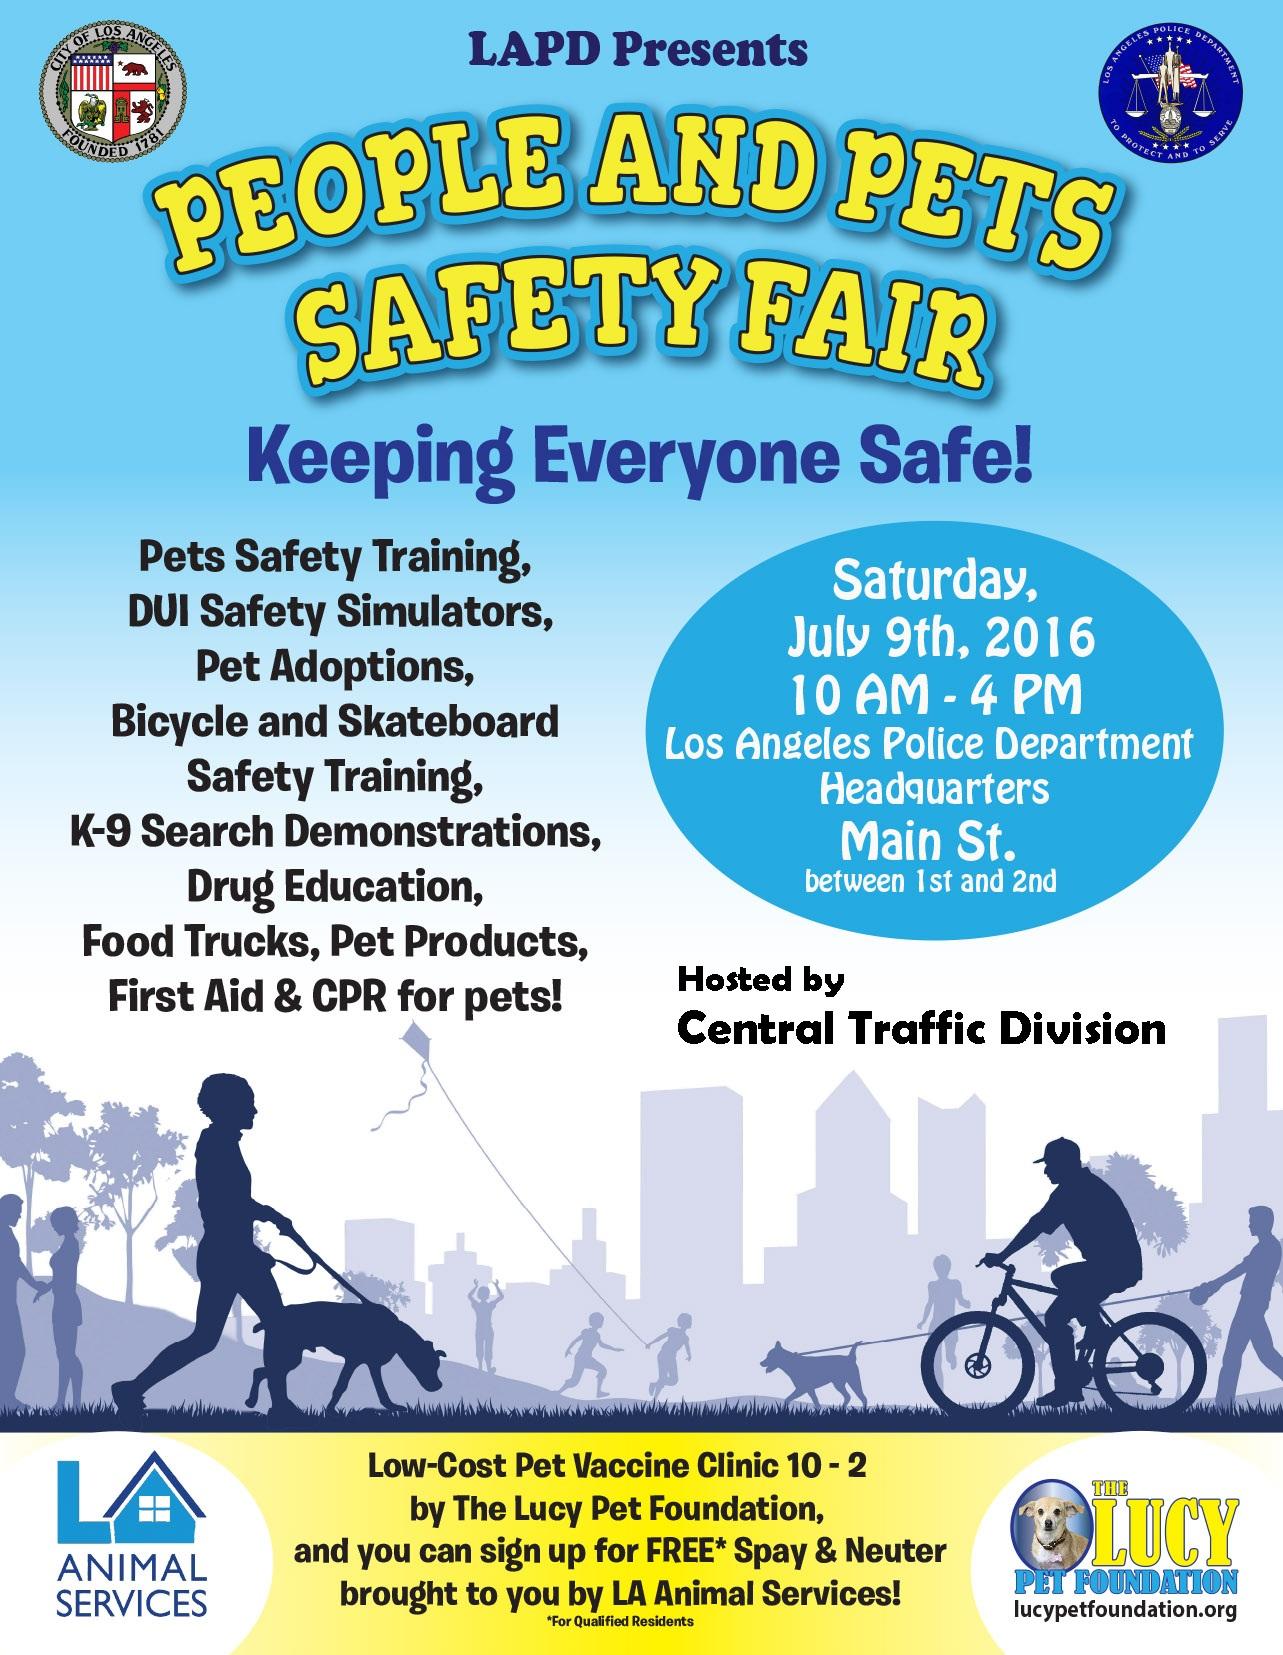 Safety_Fair_Flier.jpg